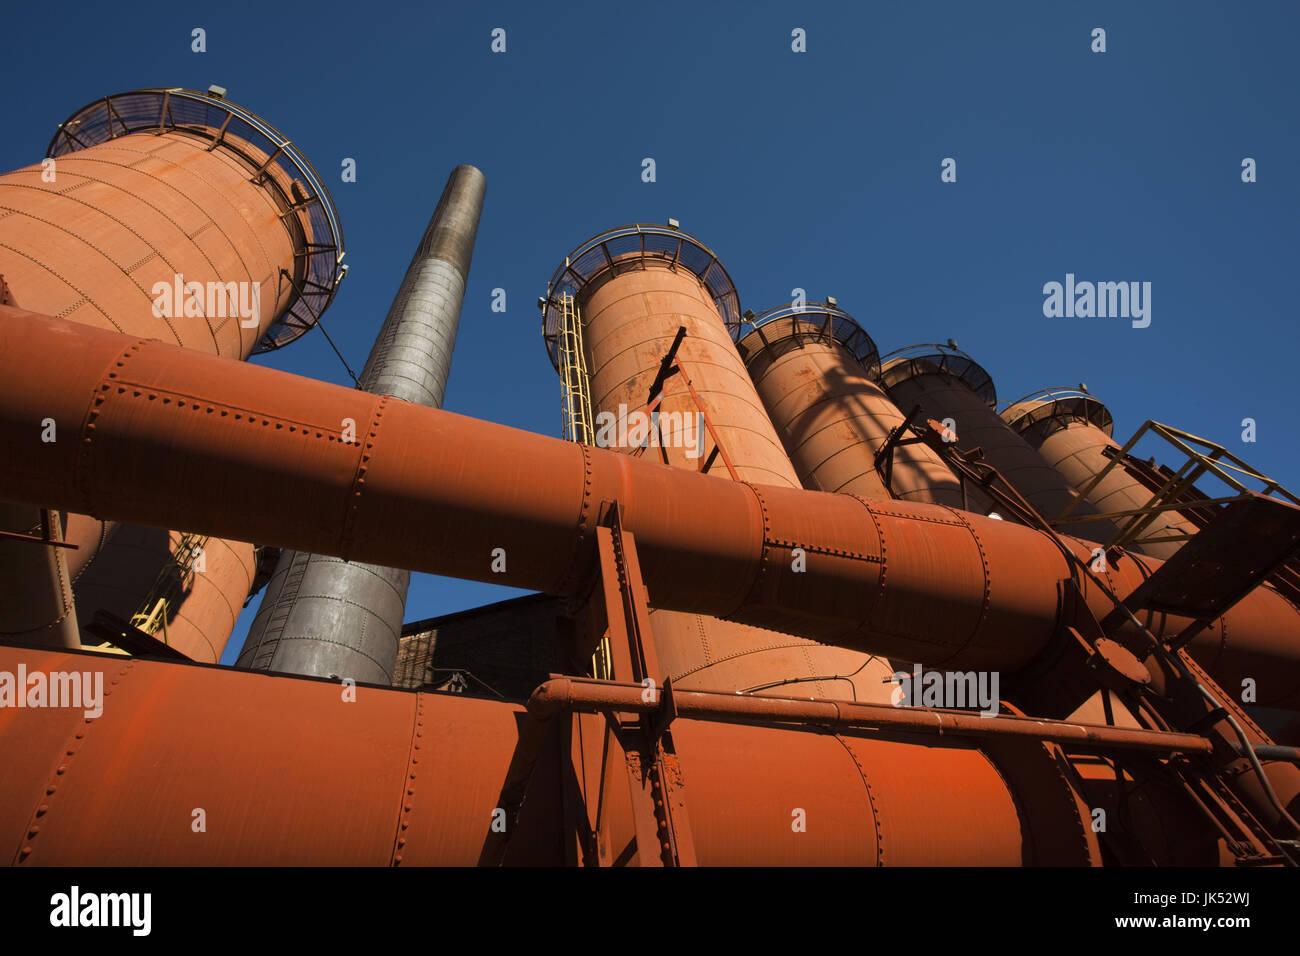 USA, Alabama, Birmingham, Sloss Furnaces National Historic Landmark, late 19th to mid 20th century blast furnace, - Stock Image